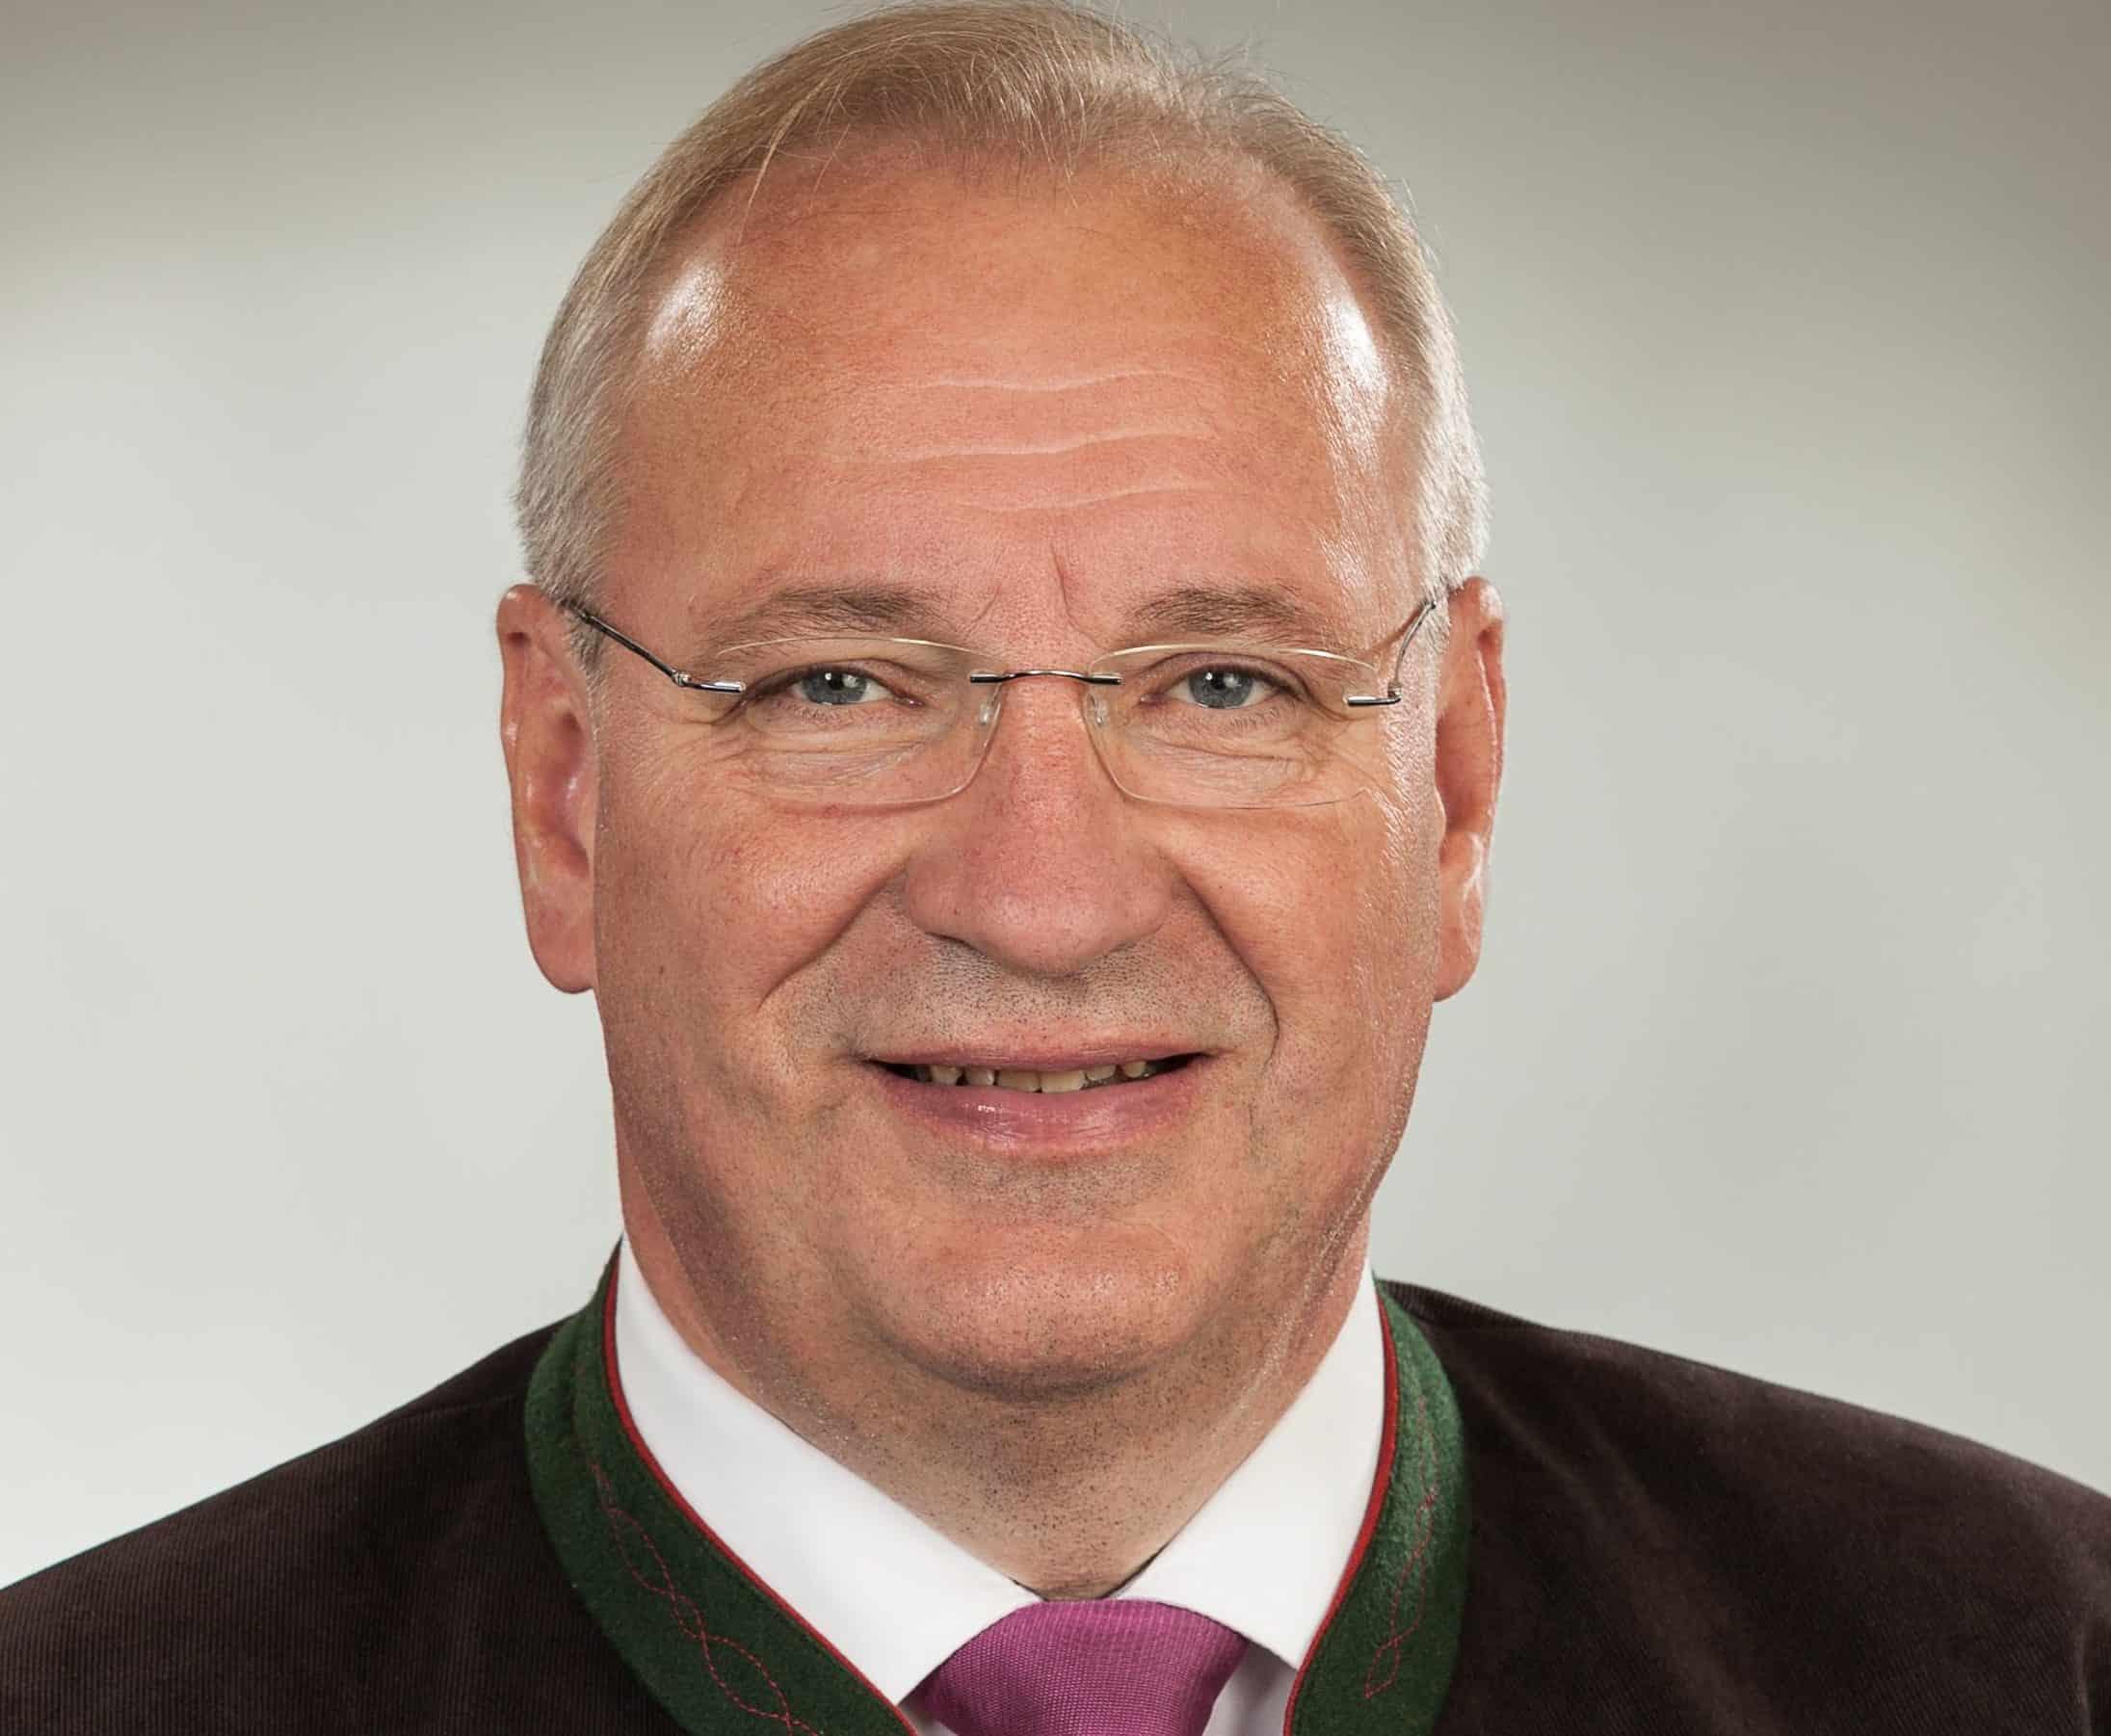 Bezirkstagspräsidenten Franz Löffler sendet Neujahrsgrüße